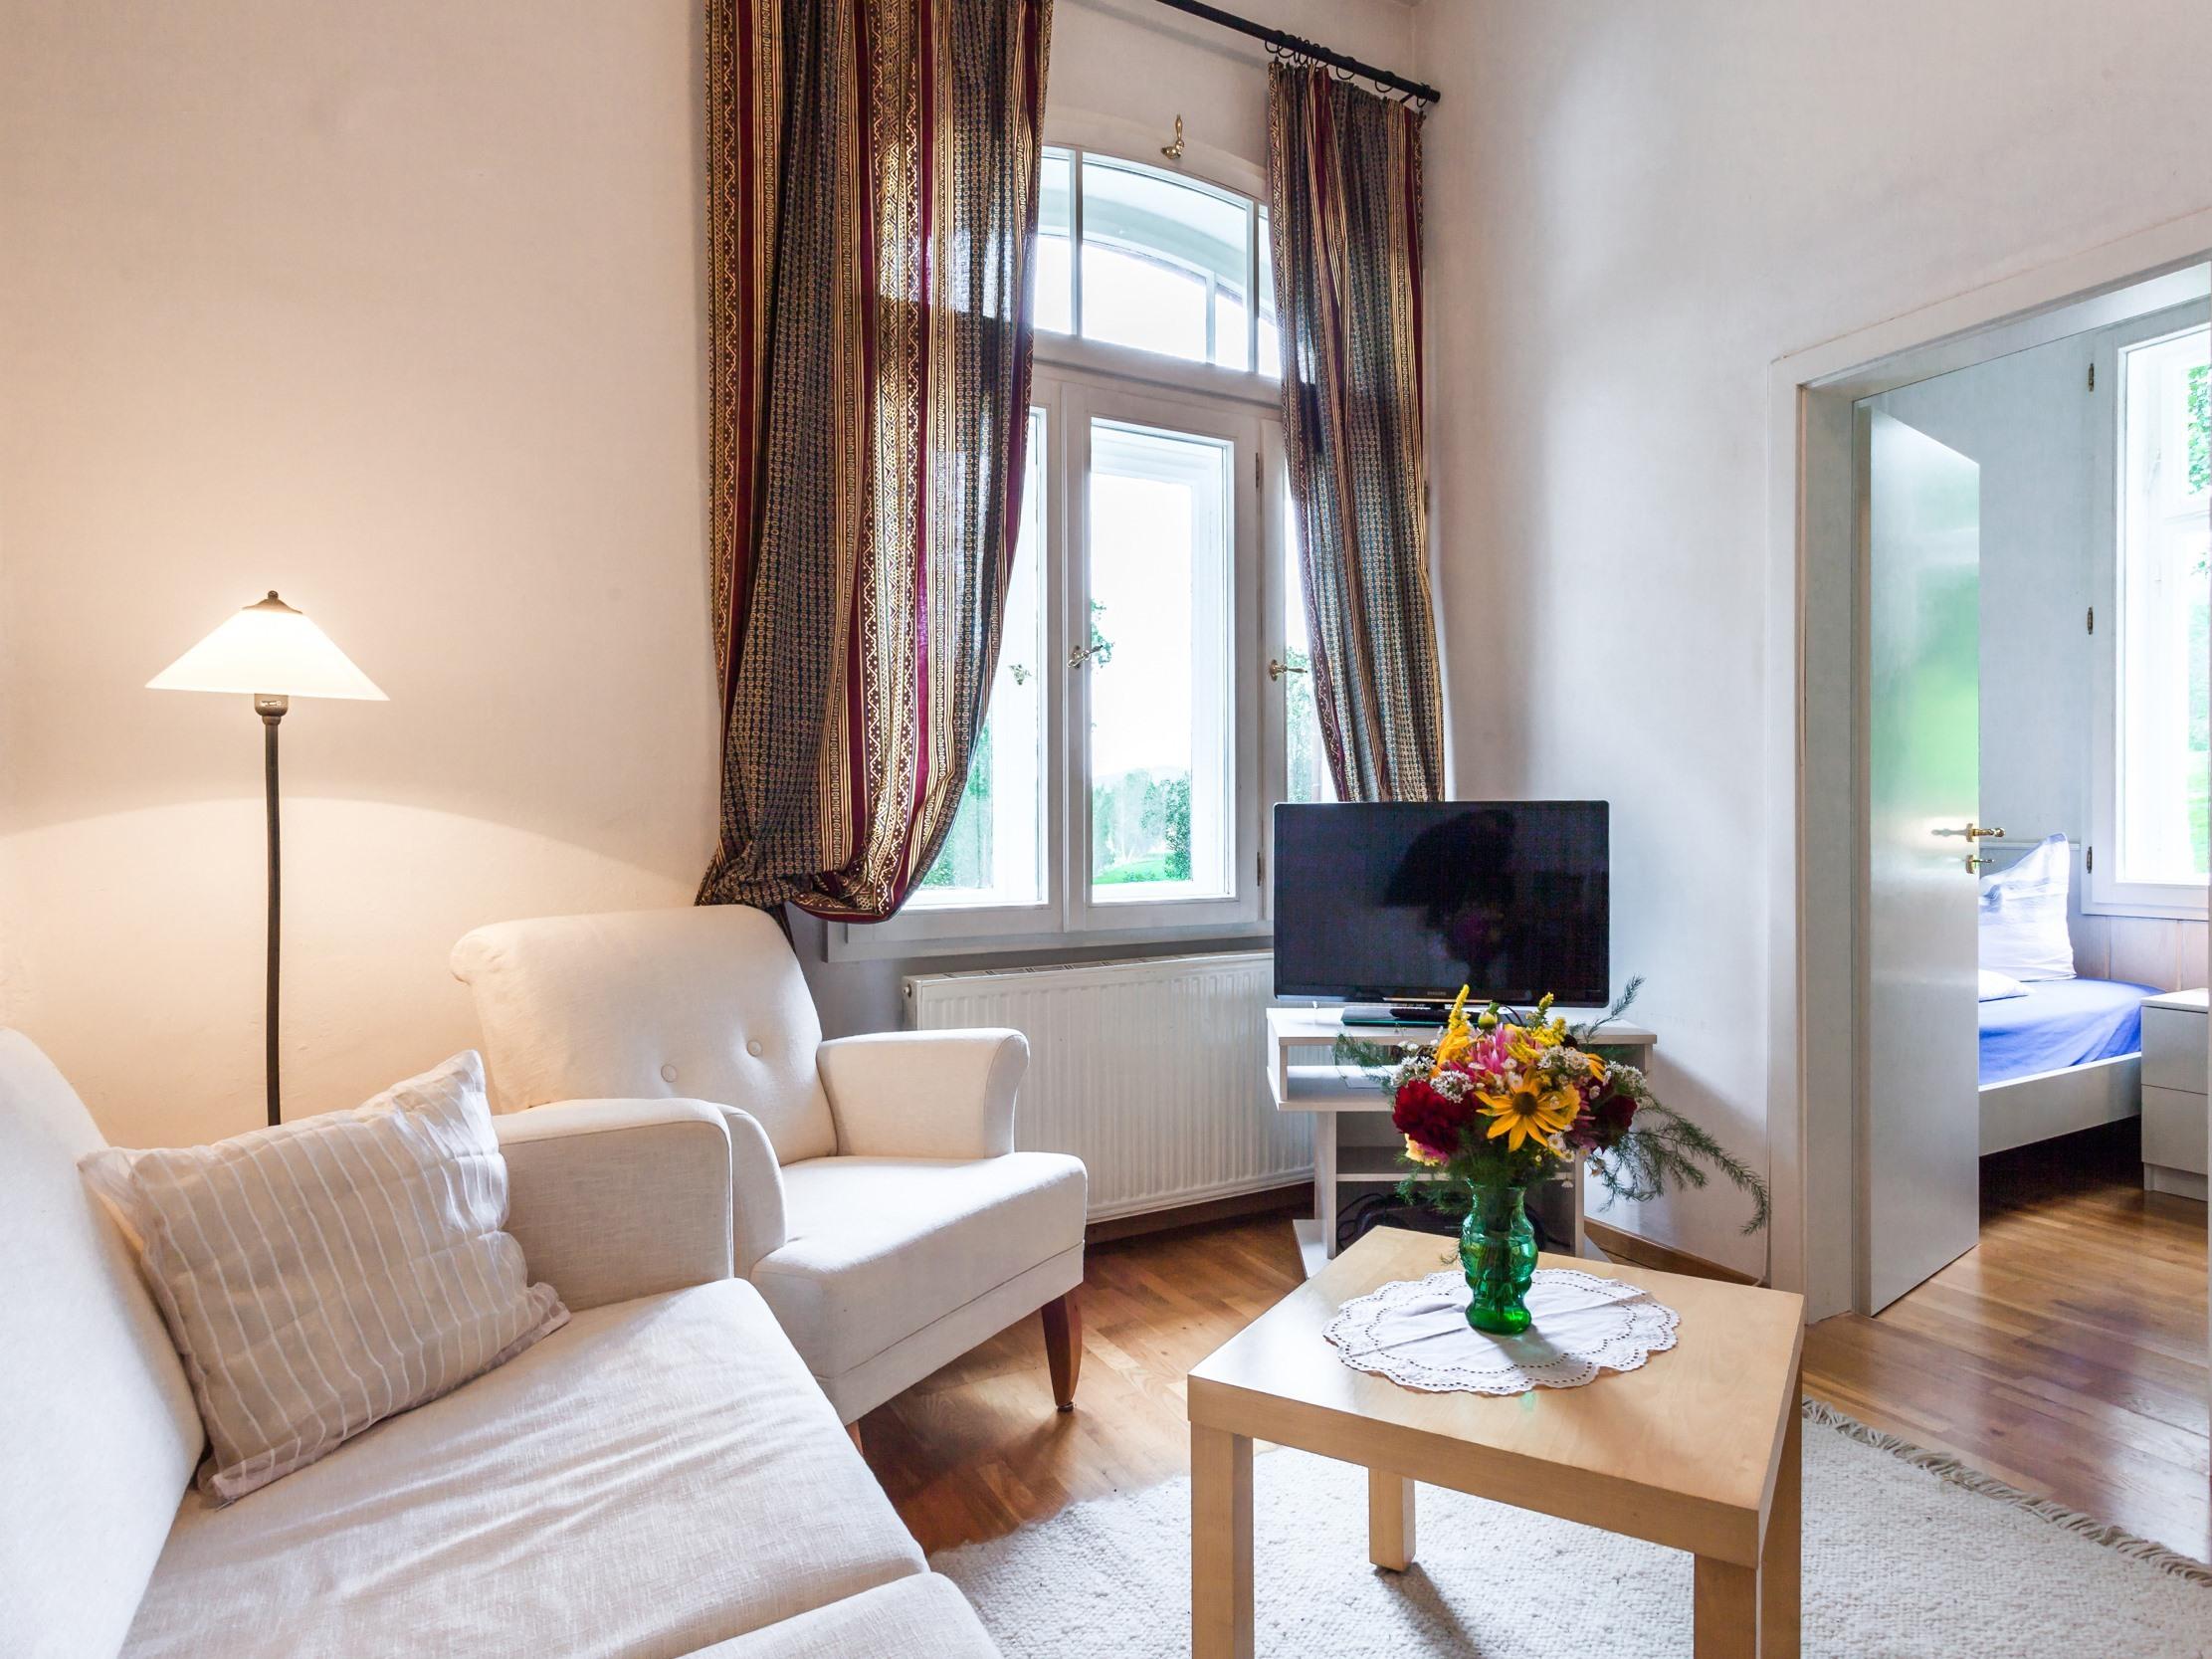 Apartment-Ensuite Dusche-App. 1 - EG - Standardpreis